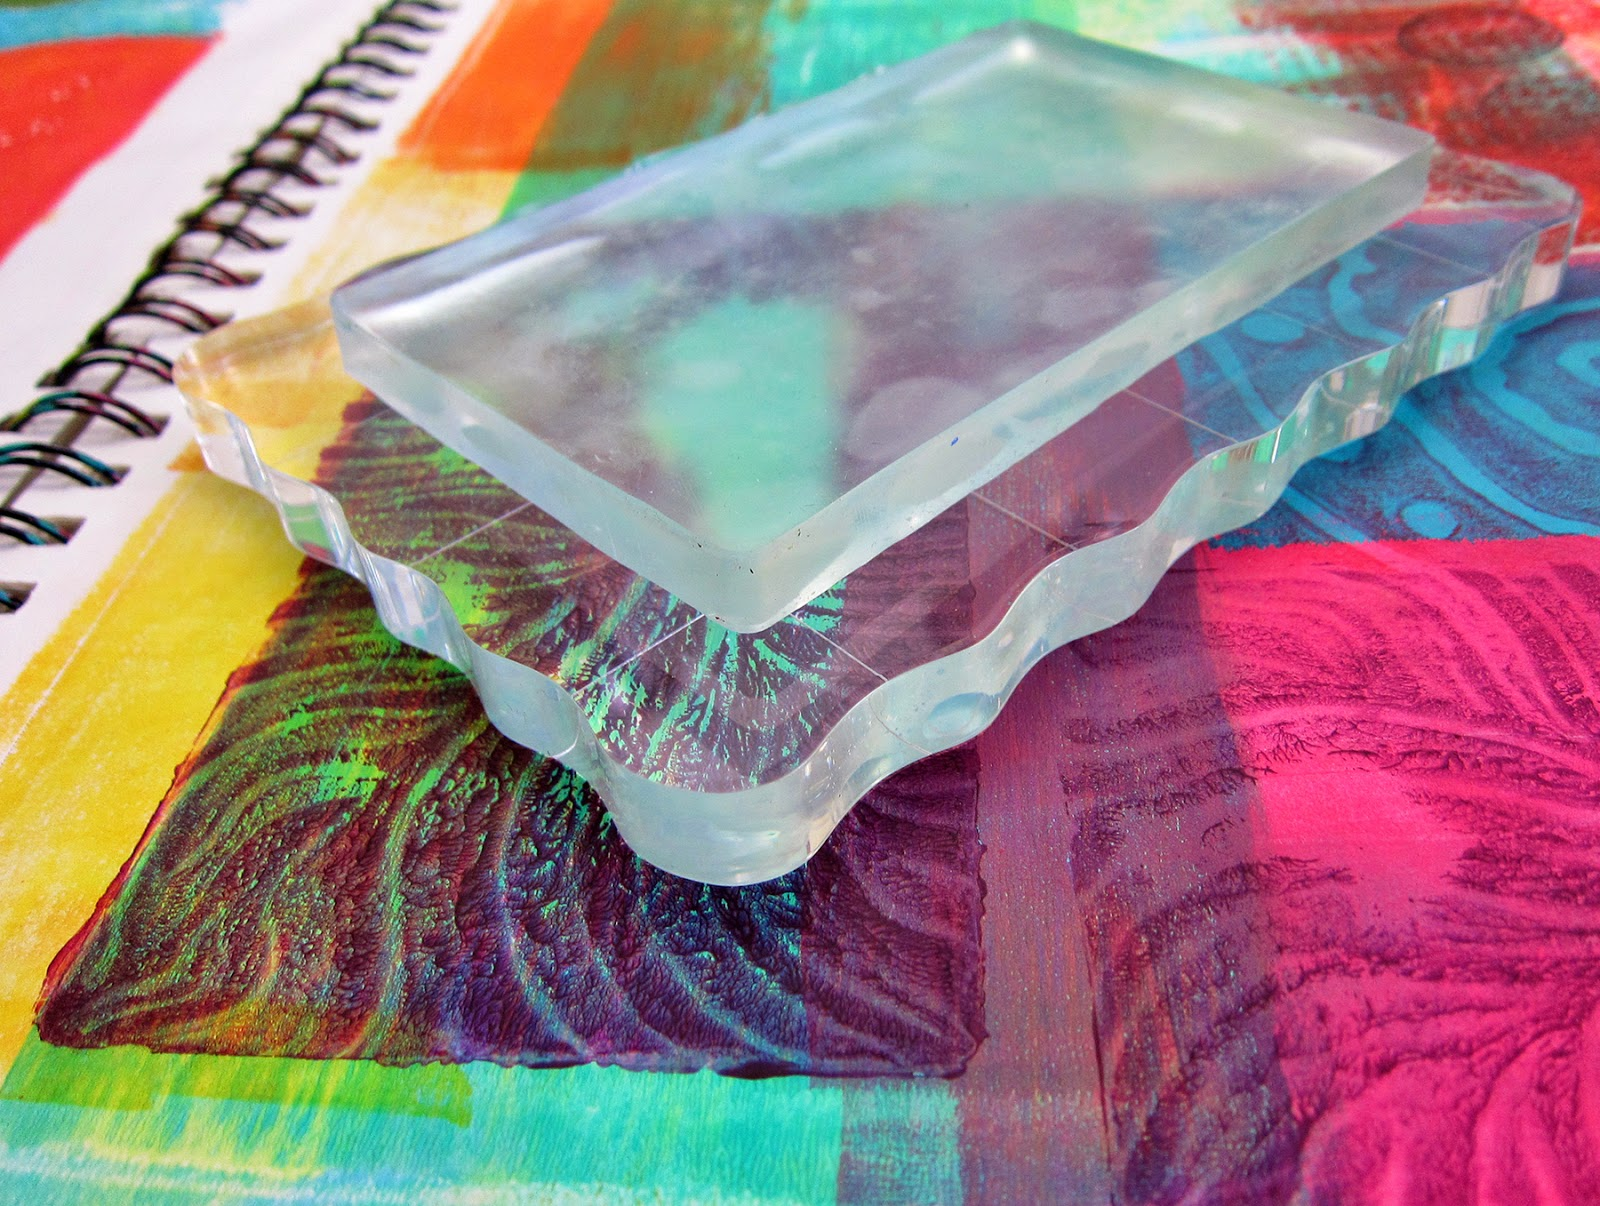 colouricious-gelli-plate-3-x-5-inches